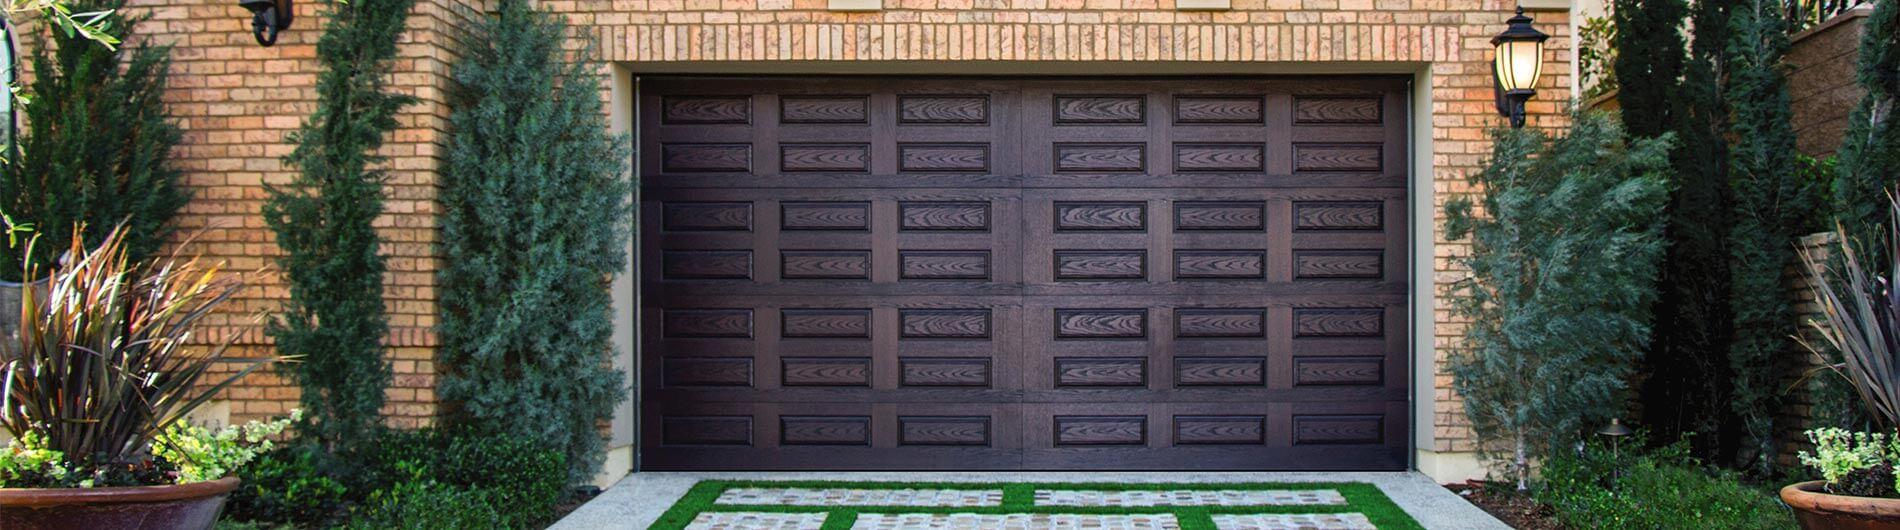 JOHN DALTON GARAGE DOORS REVIEW. FIBER GLASS DOORS